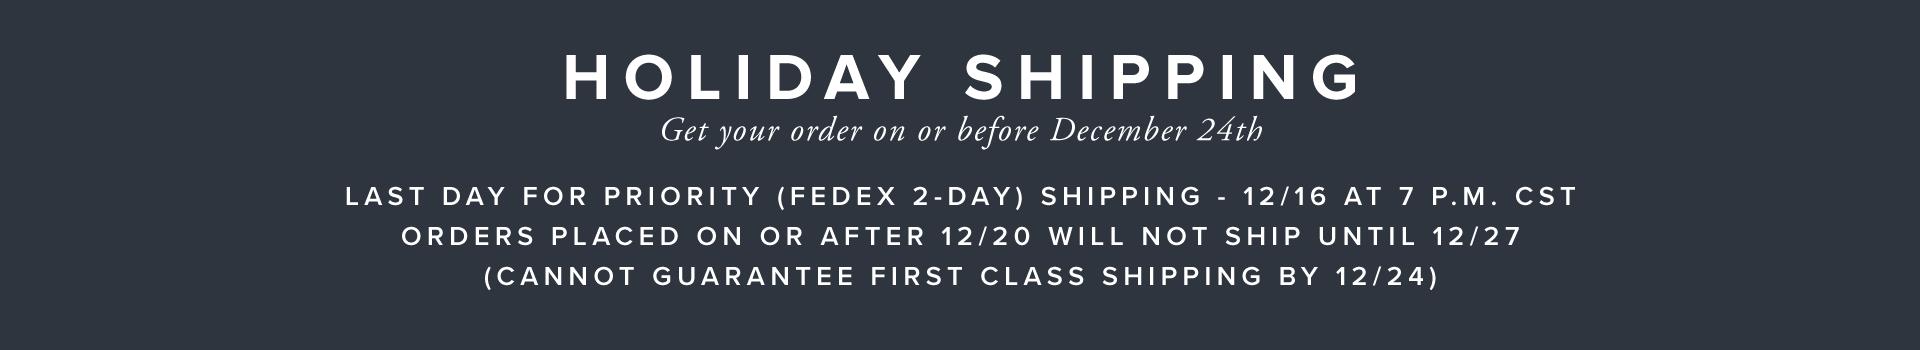 holiday-shipping-banner.png